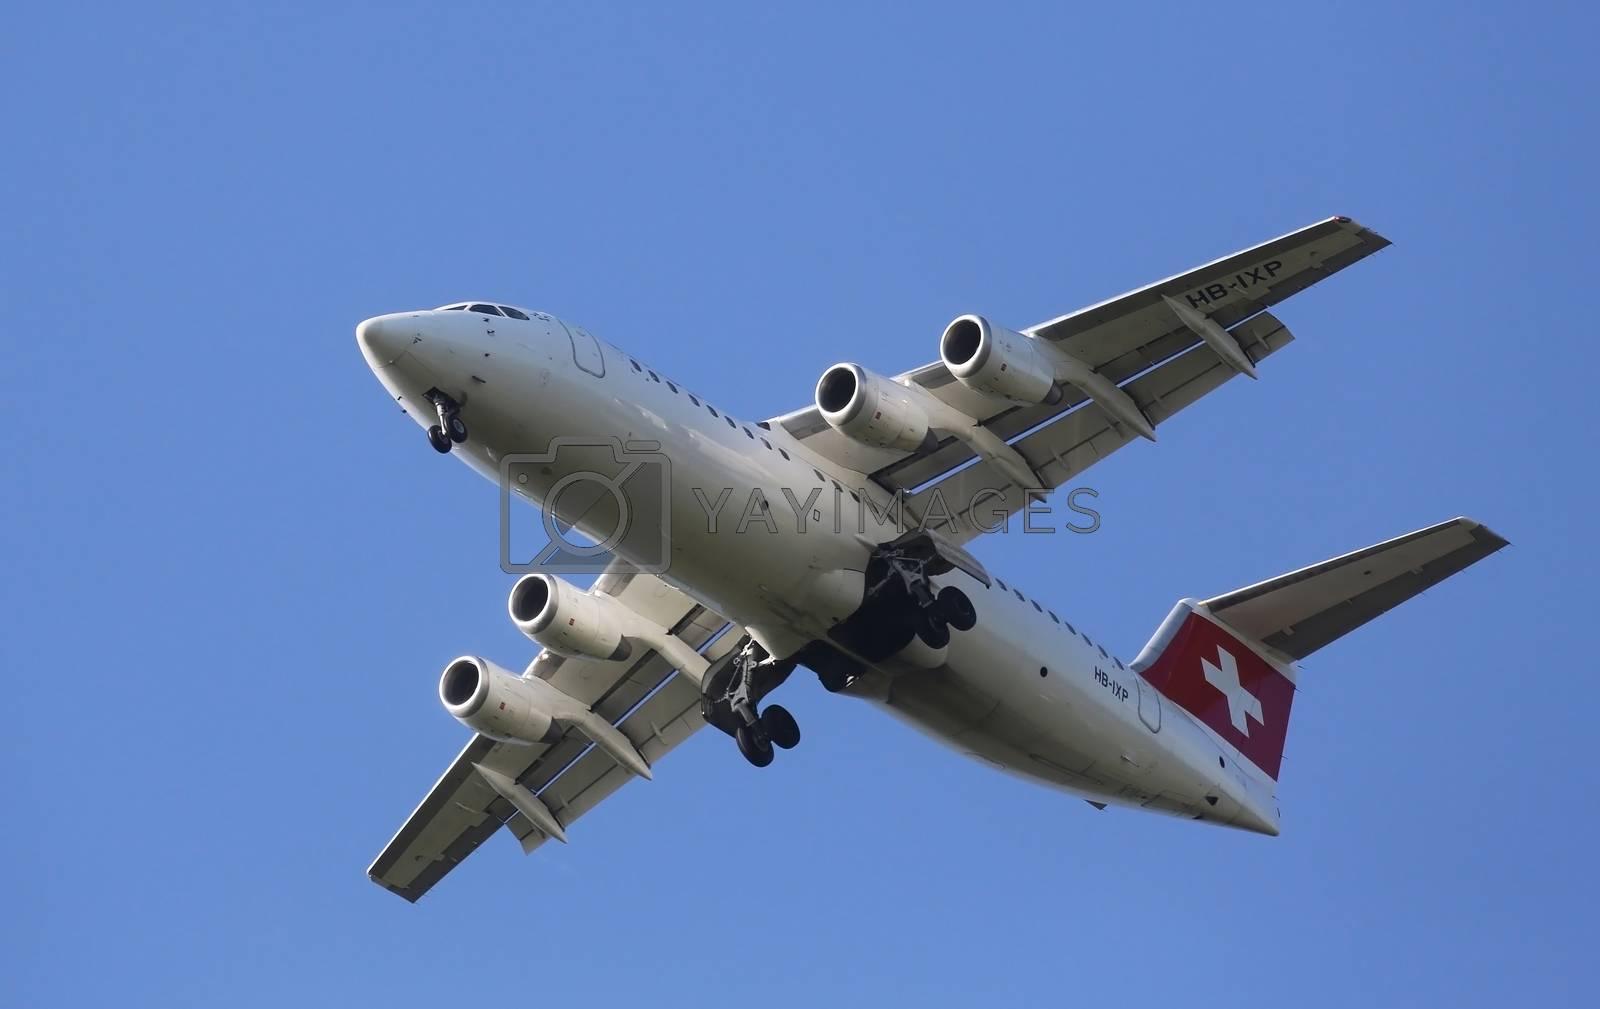 Avro RJ100, registration XB-IXP of Swiss  Airlines landing on Zagreb Airport Pleso